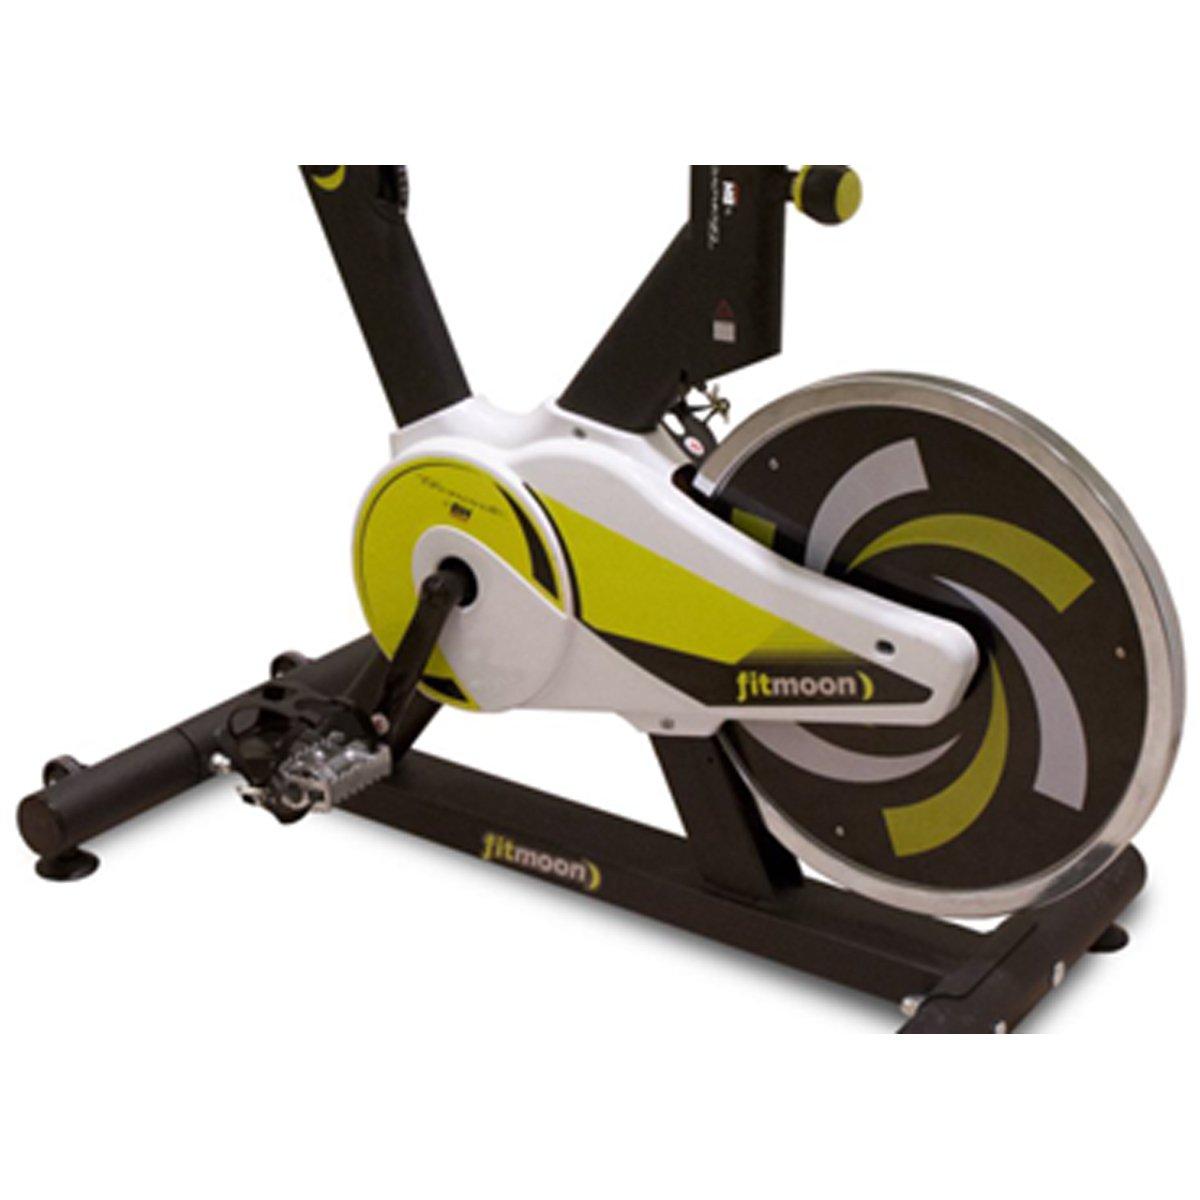 Bicicleta de Spinning Bh  Fitmoon  Yf98